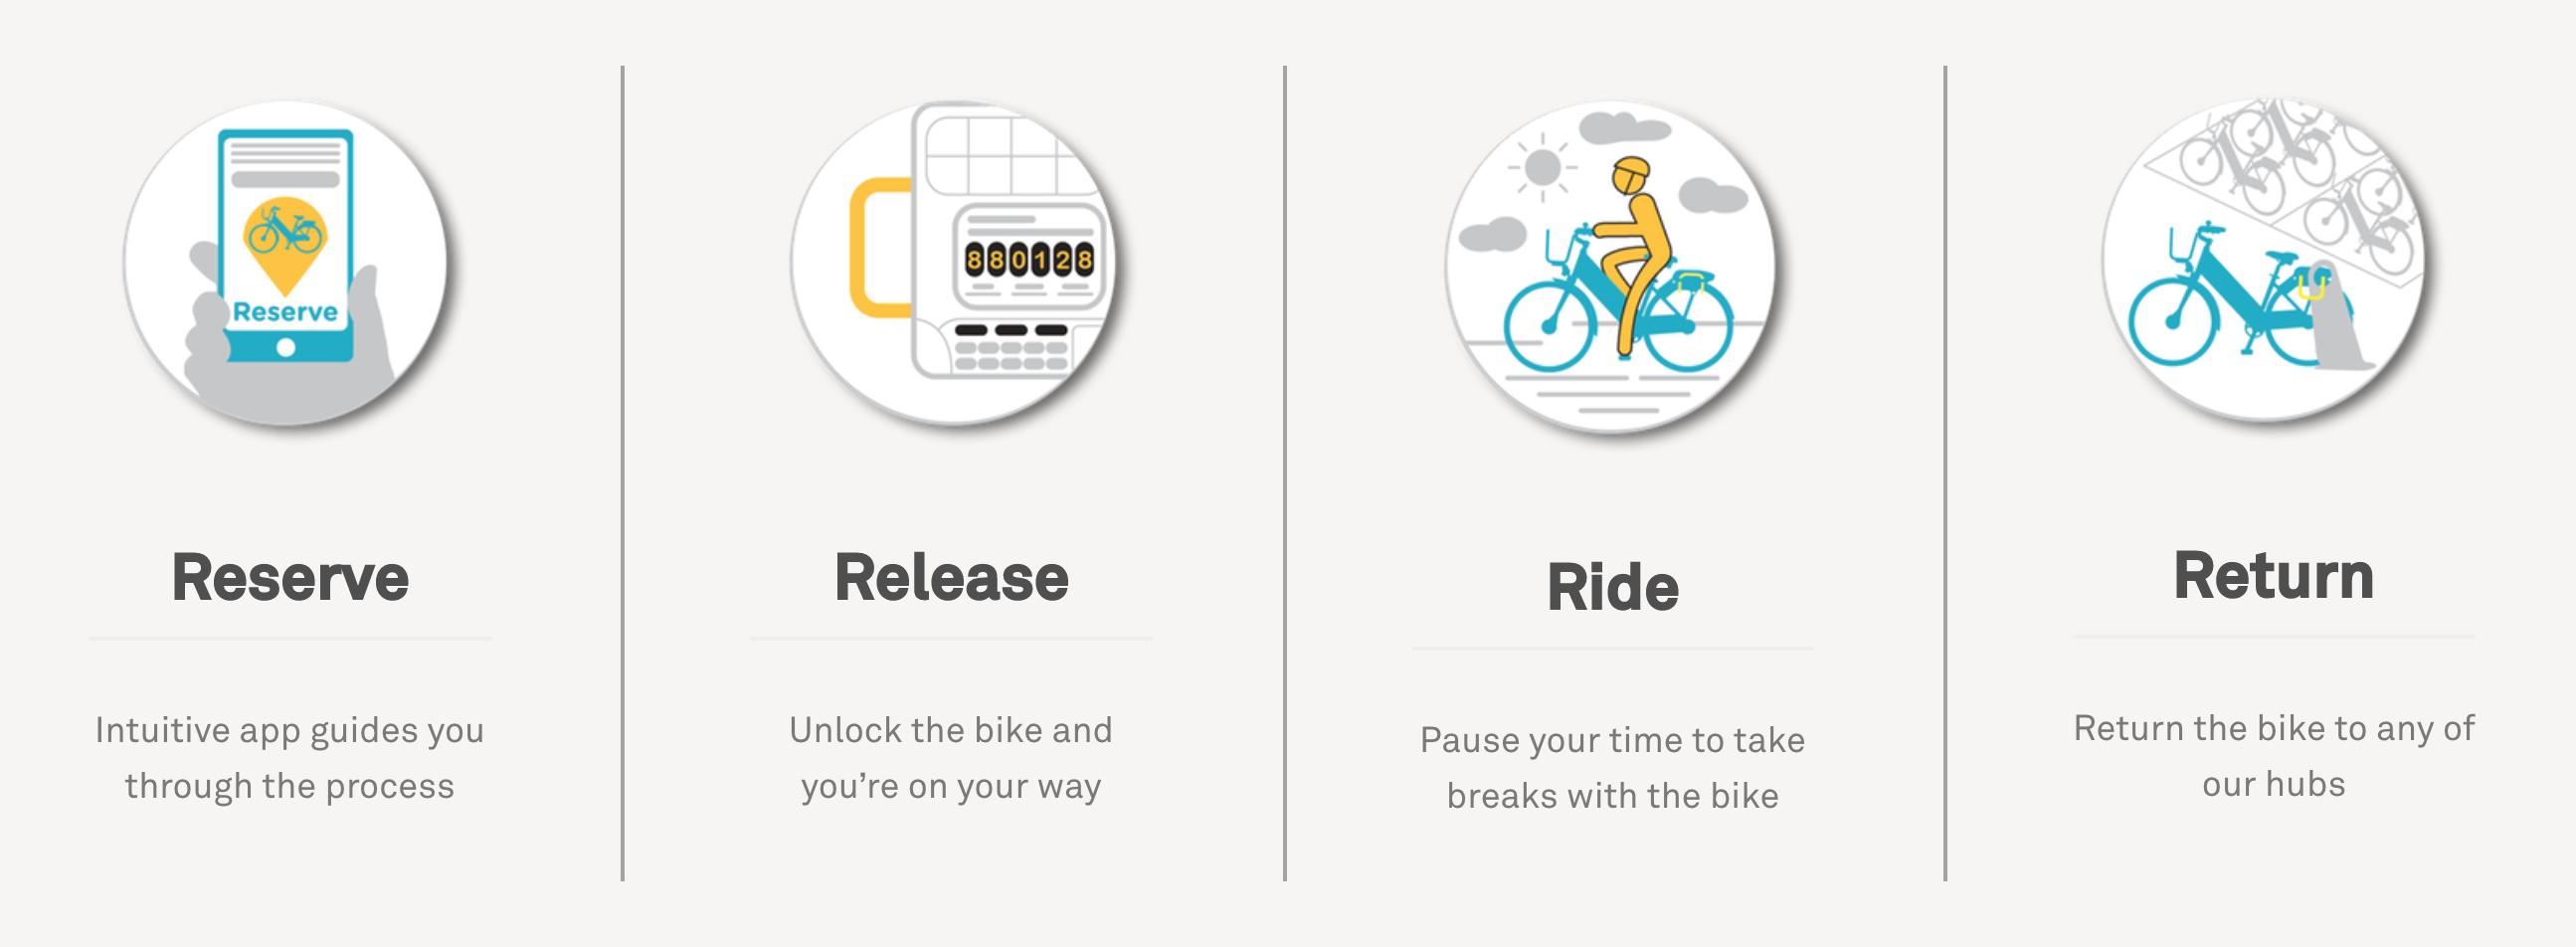 How to use Gotcha bikeshare NRV, NRV bikeshare program, new river valley, screen grab from gotcha